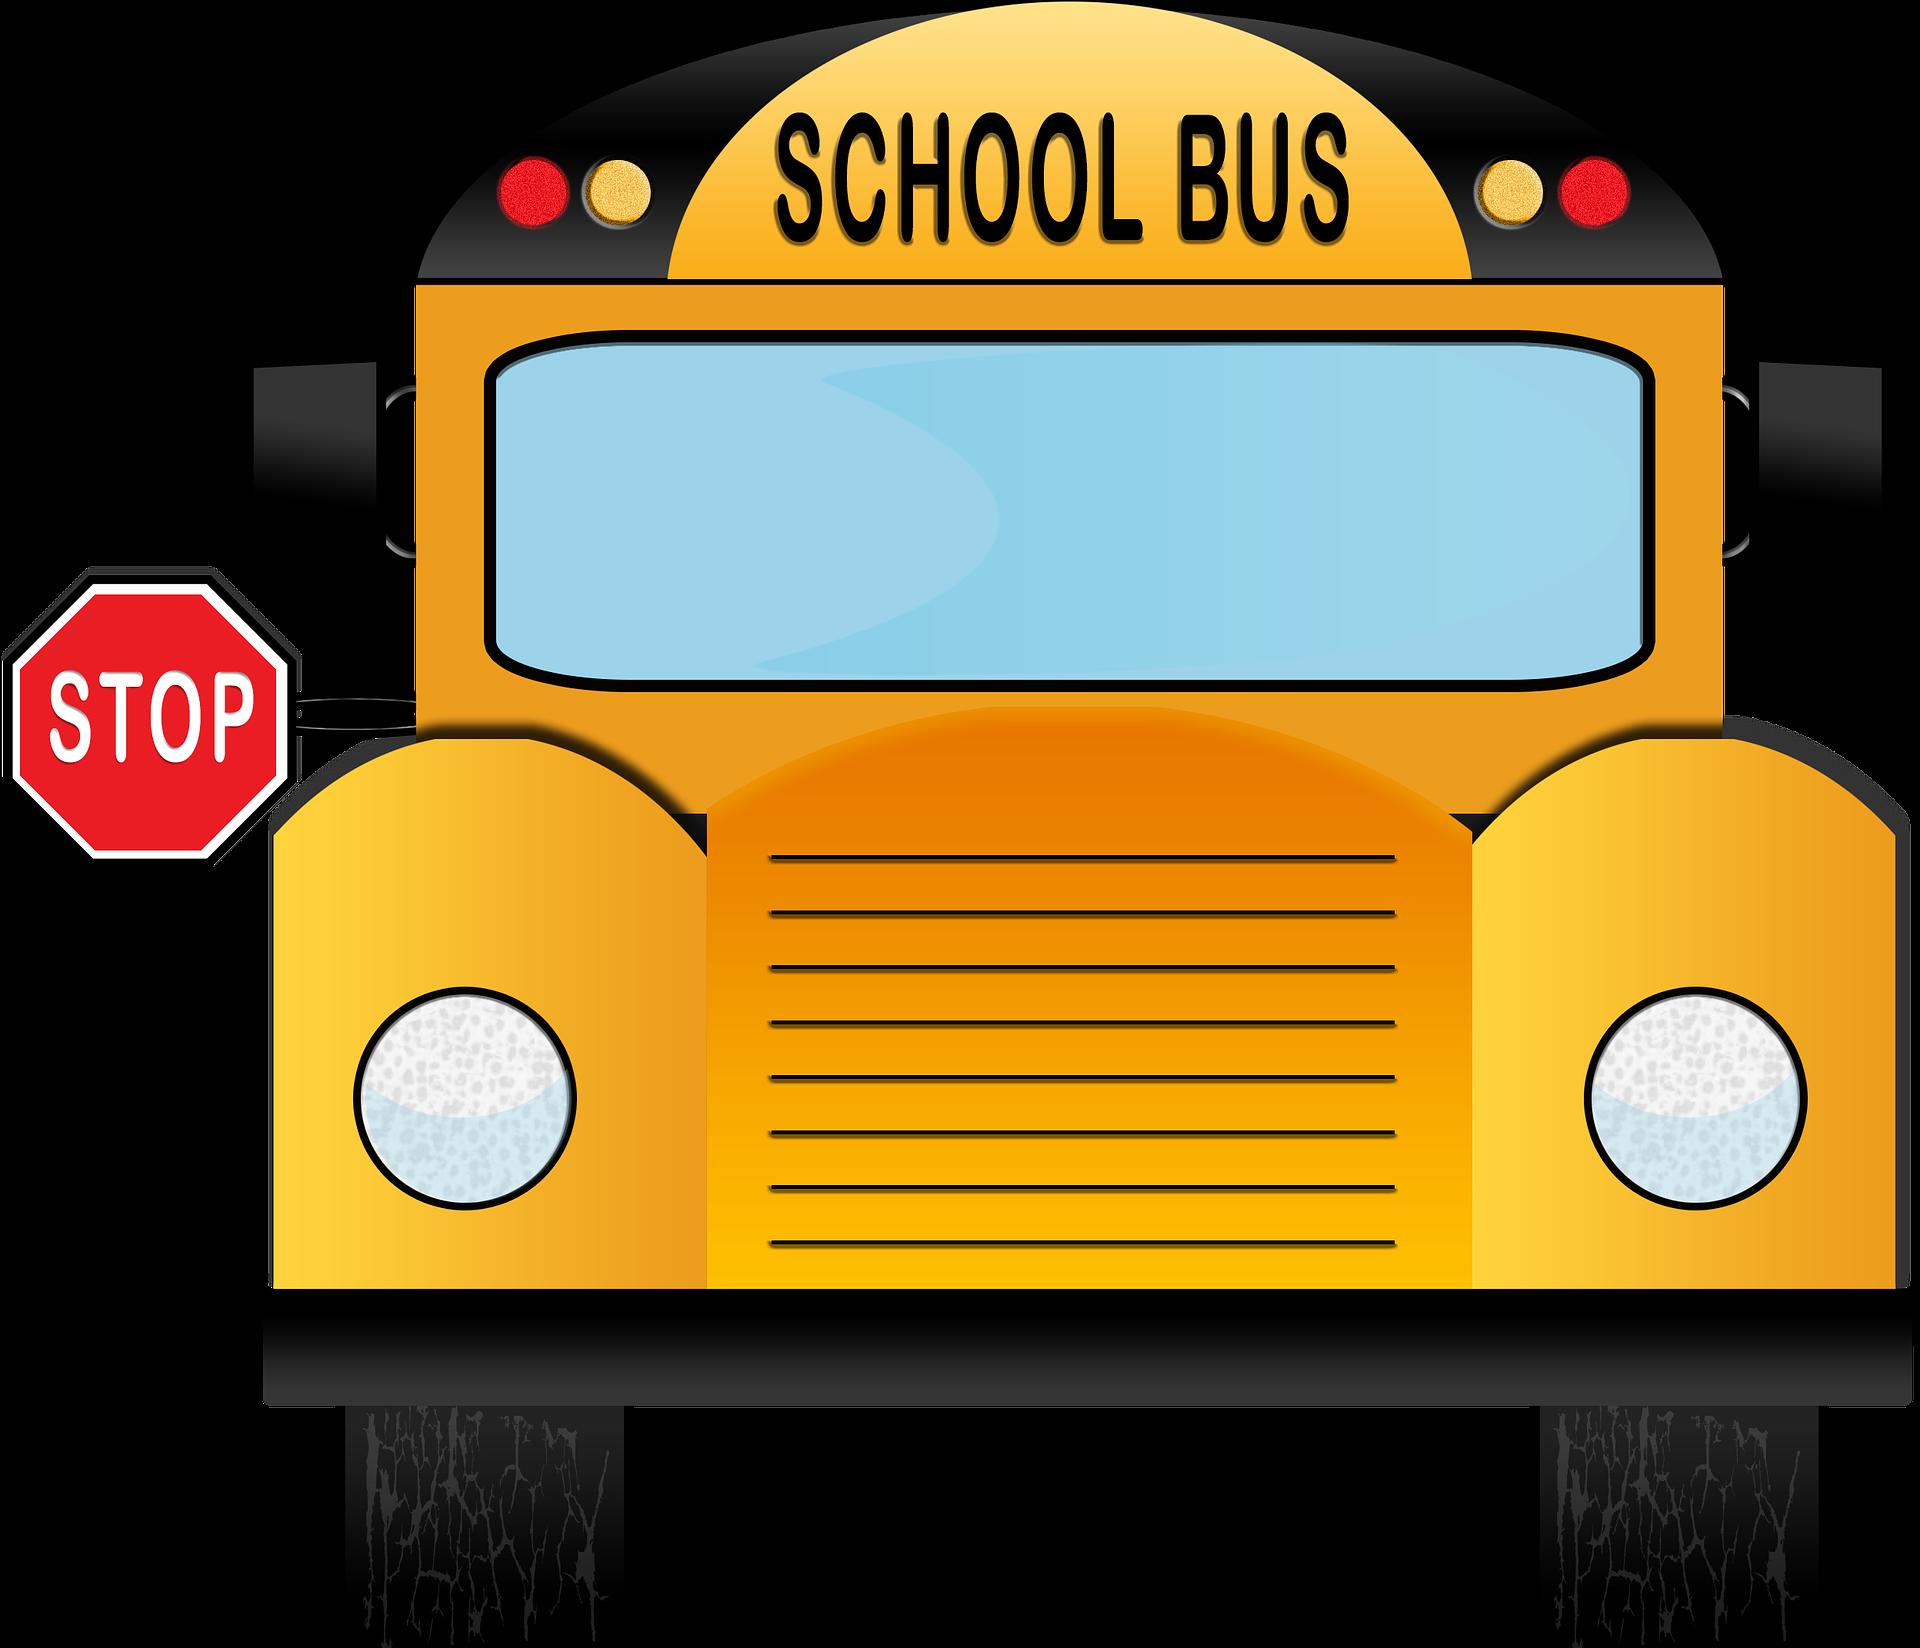 school-bus-1563493_1920